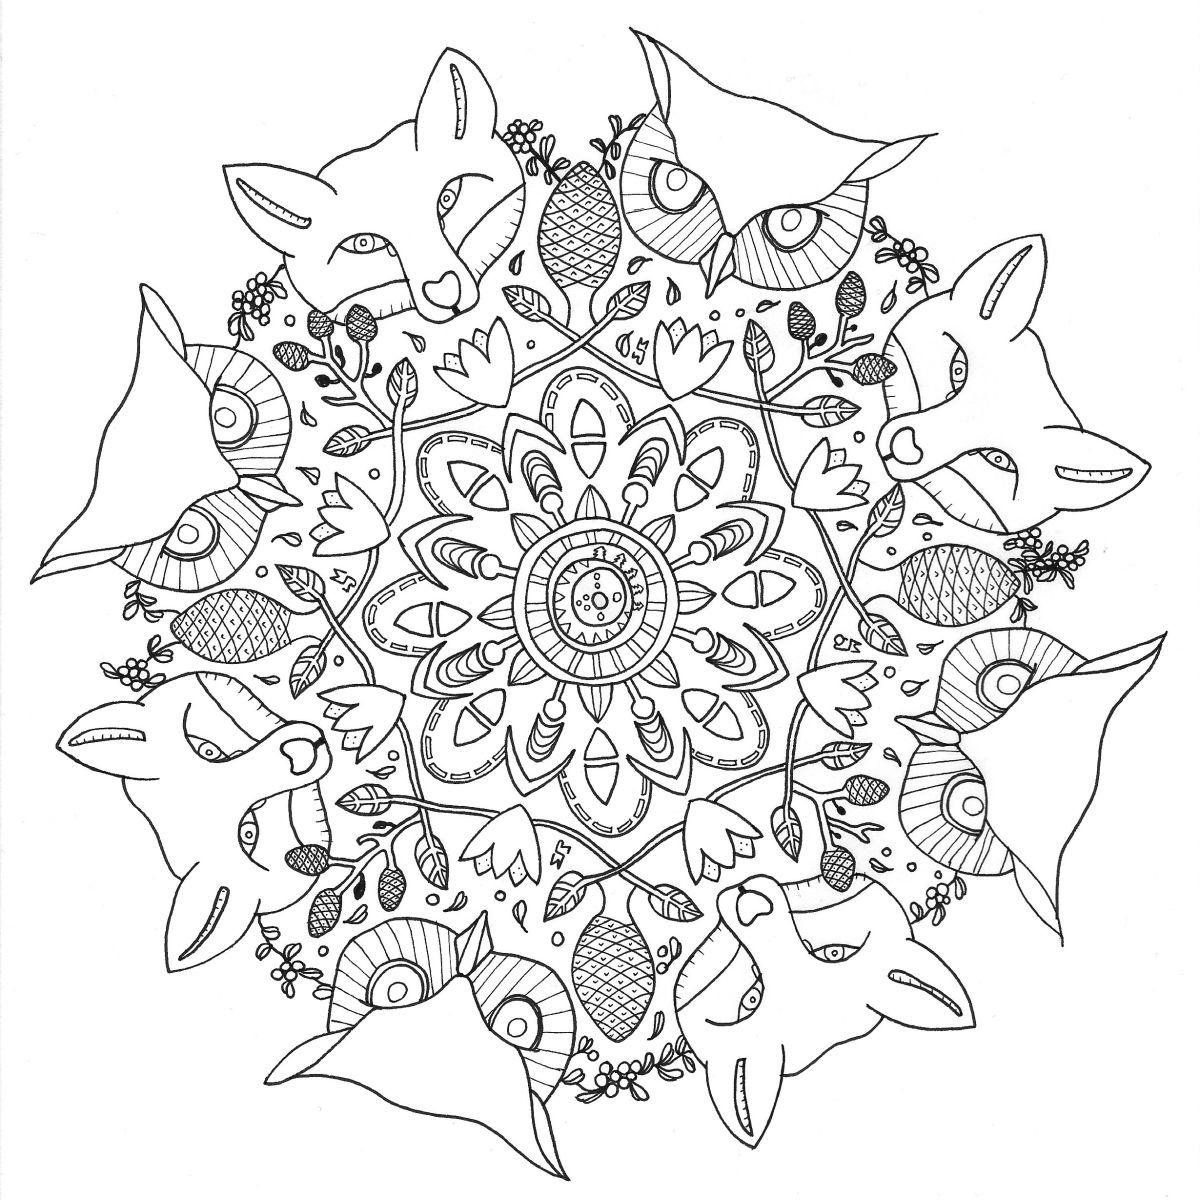 Livro Jardim Secreto Desenhos De Mandalas Coloracao Adulta E